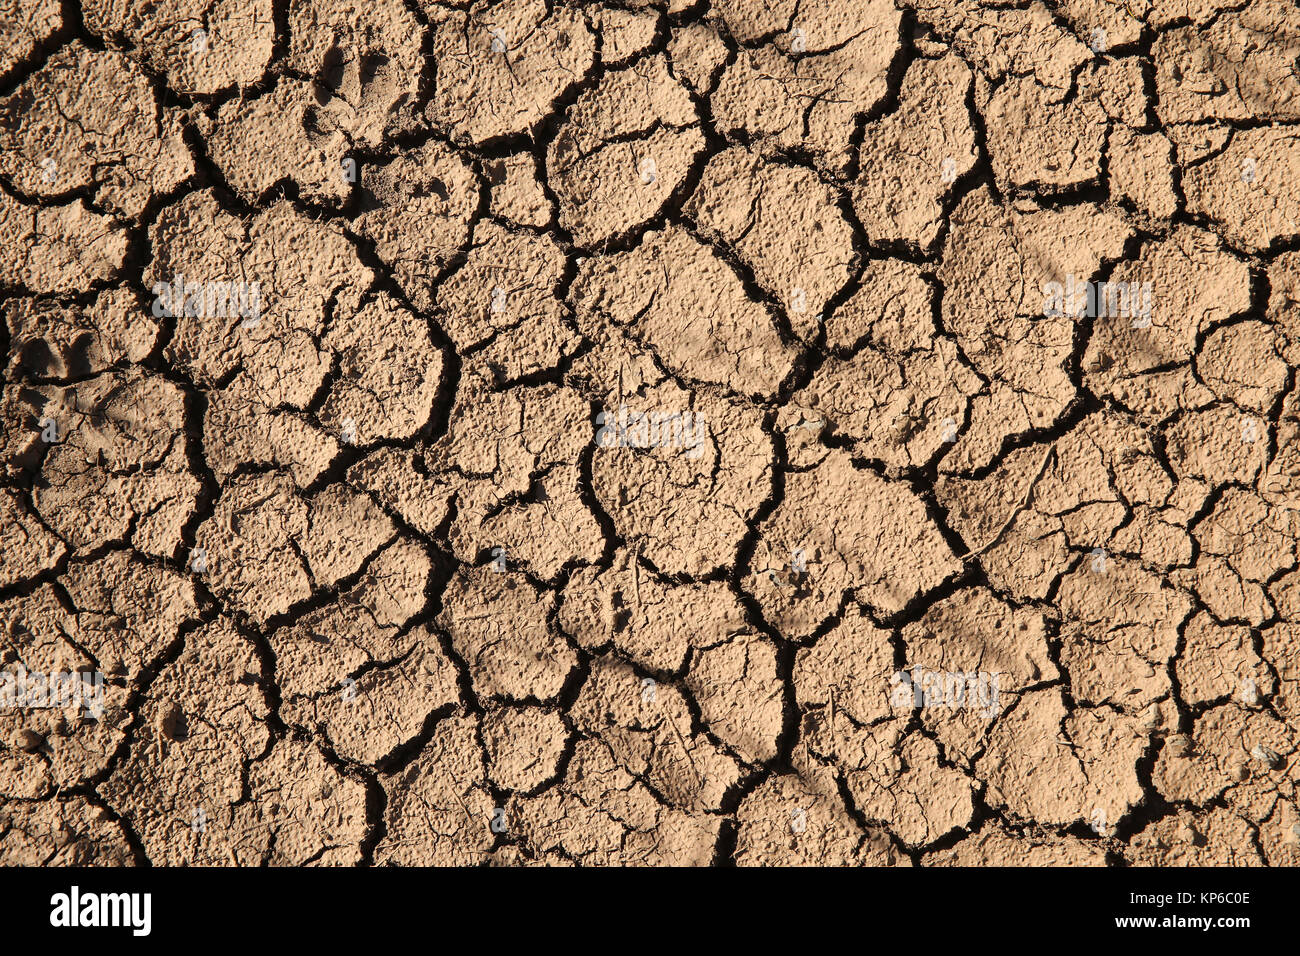 Dry cracked ground. Remuzat. France. - Stock Image